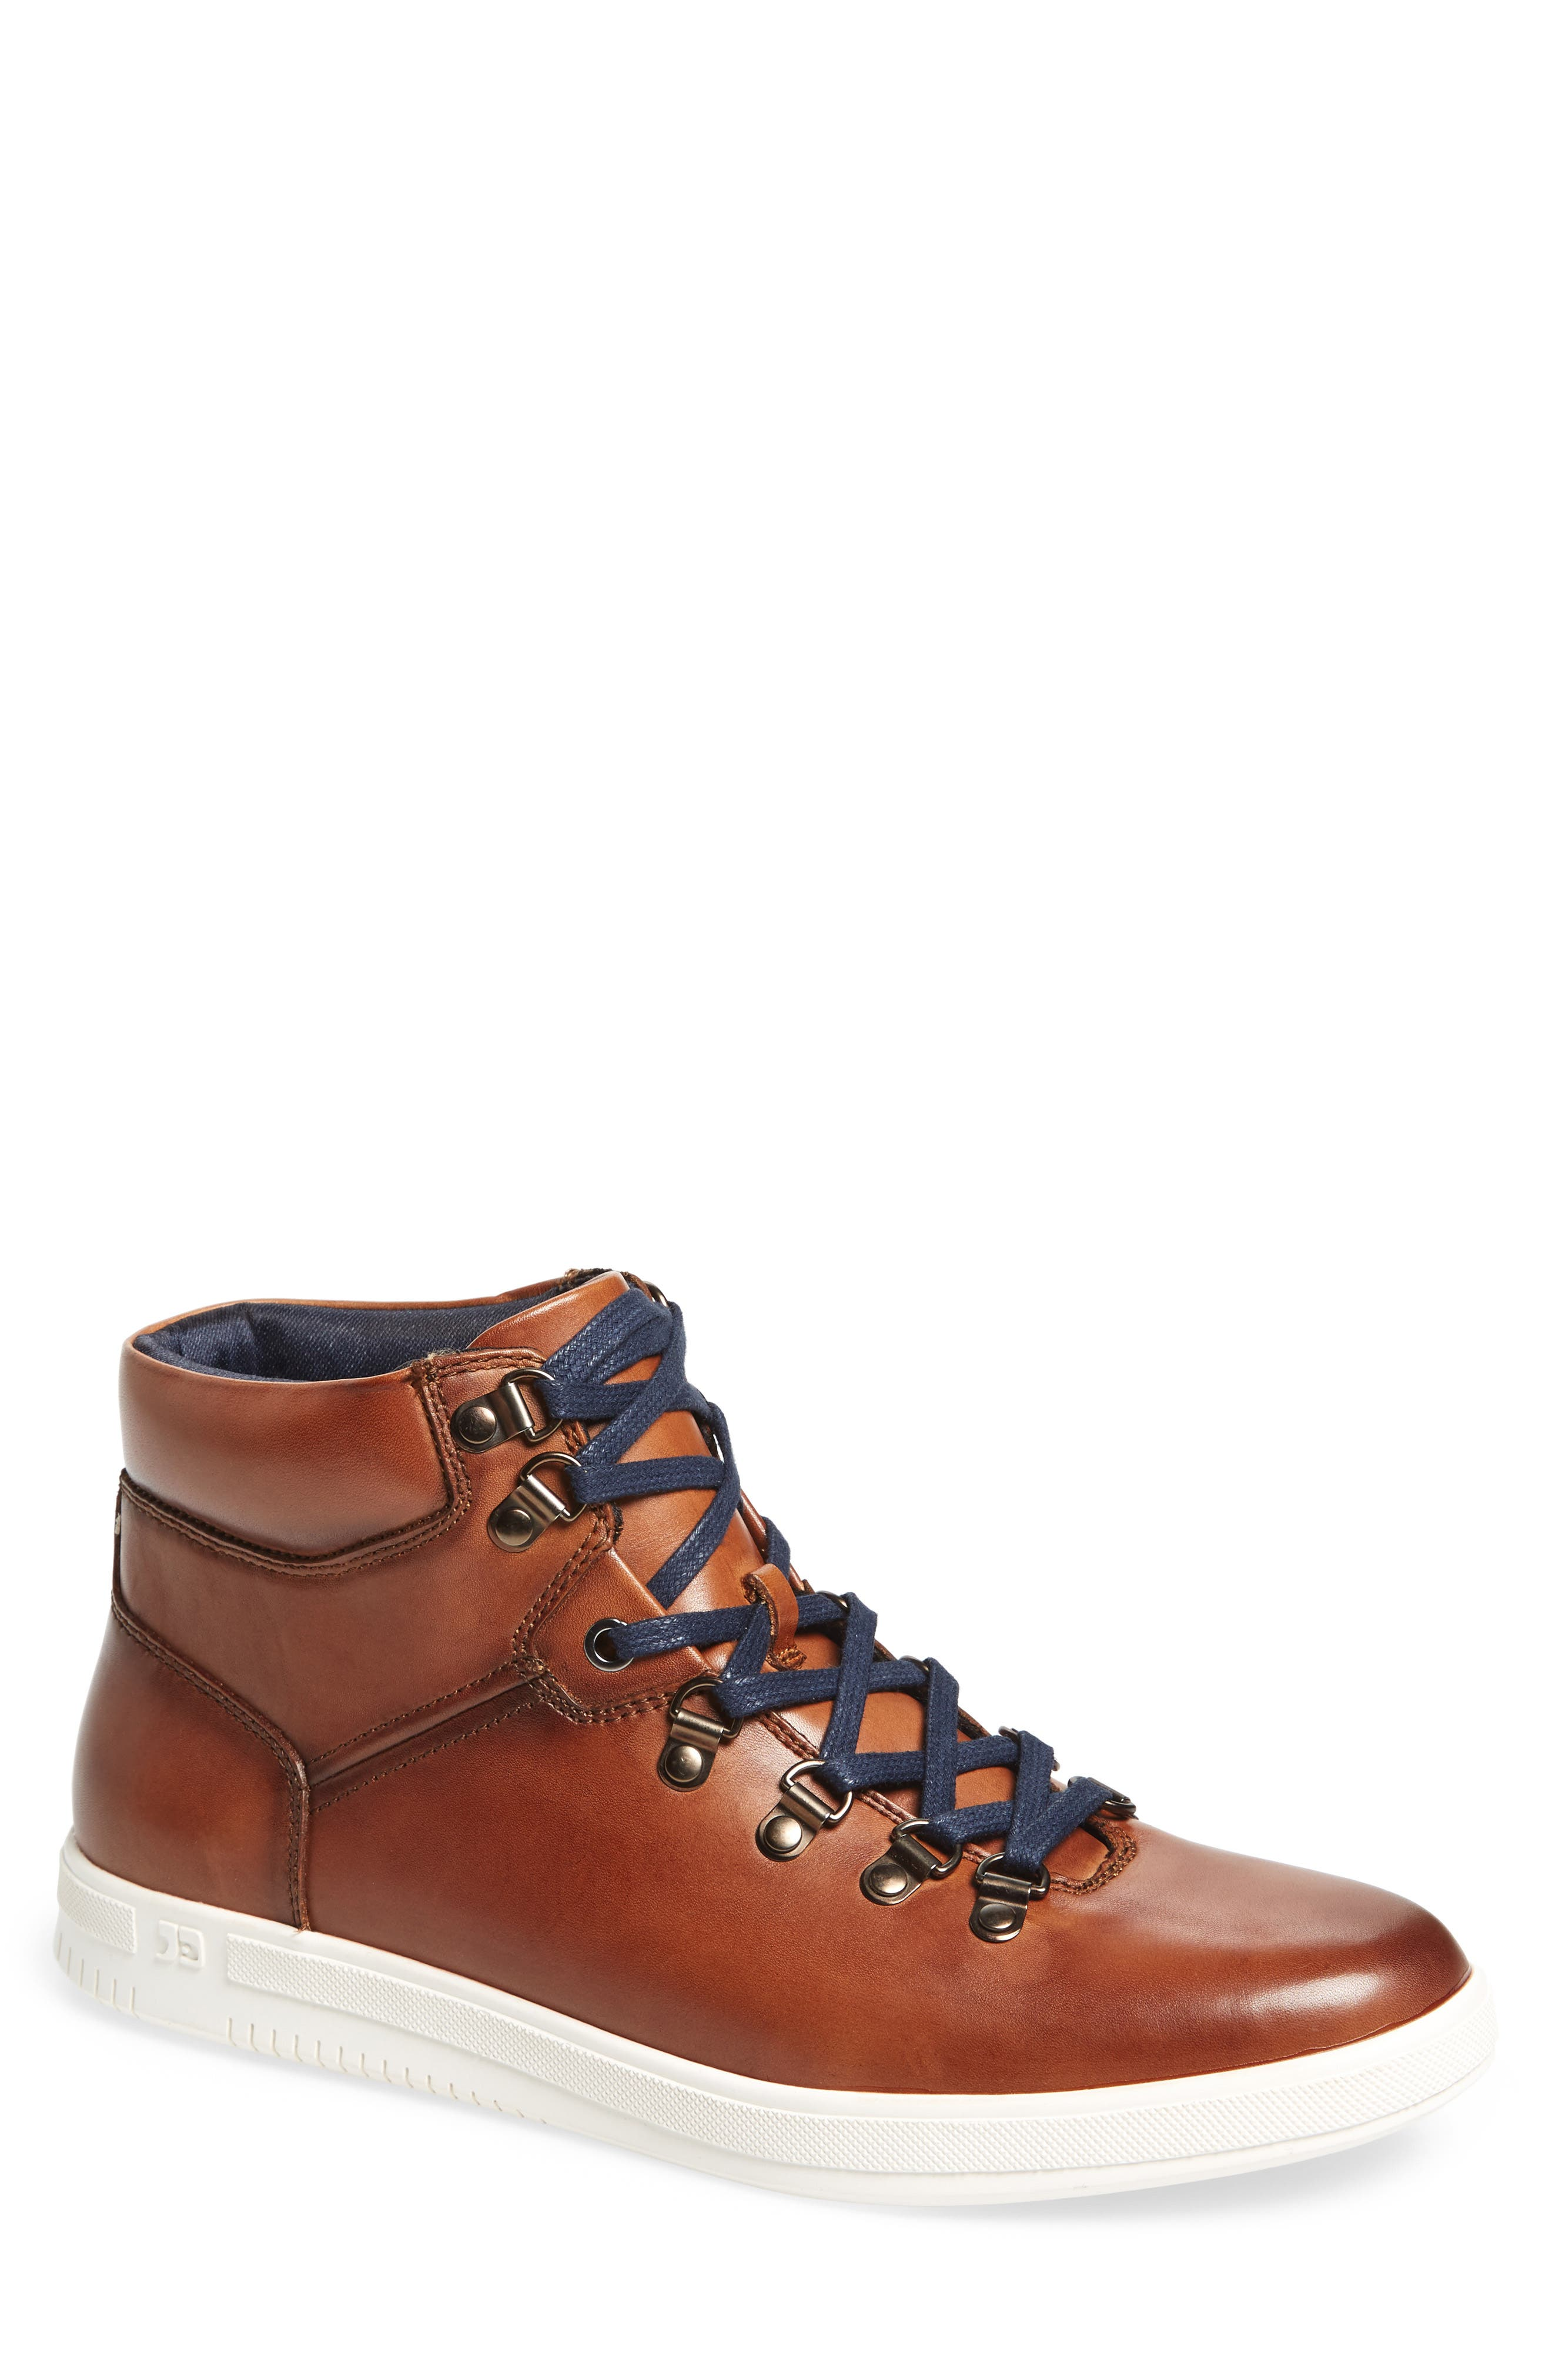 Slow Joe Mid Top Sneaker,                         Main,                         color, Tan Leather